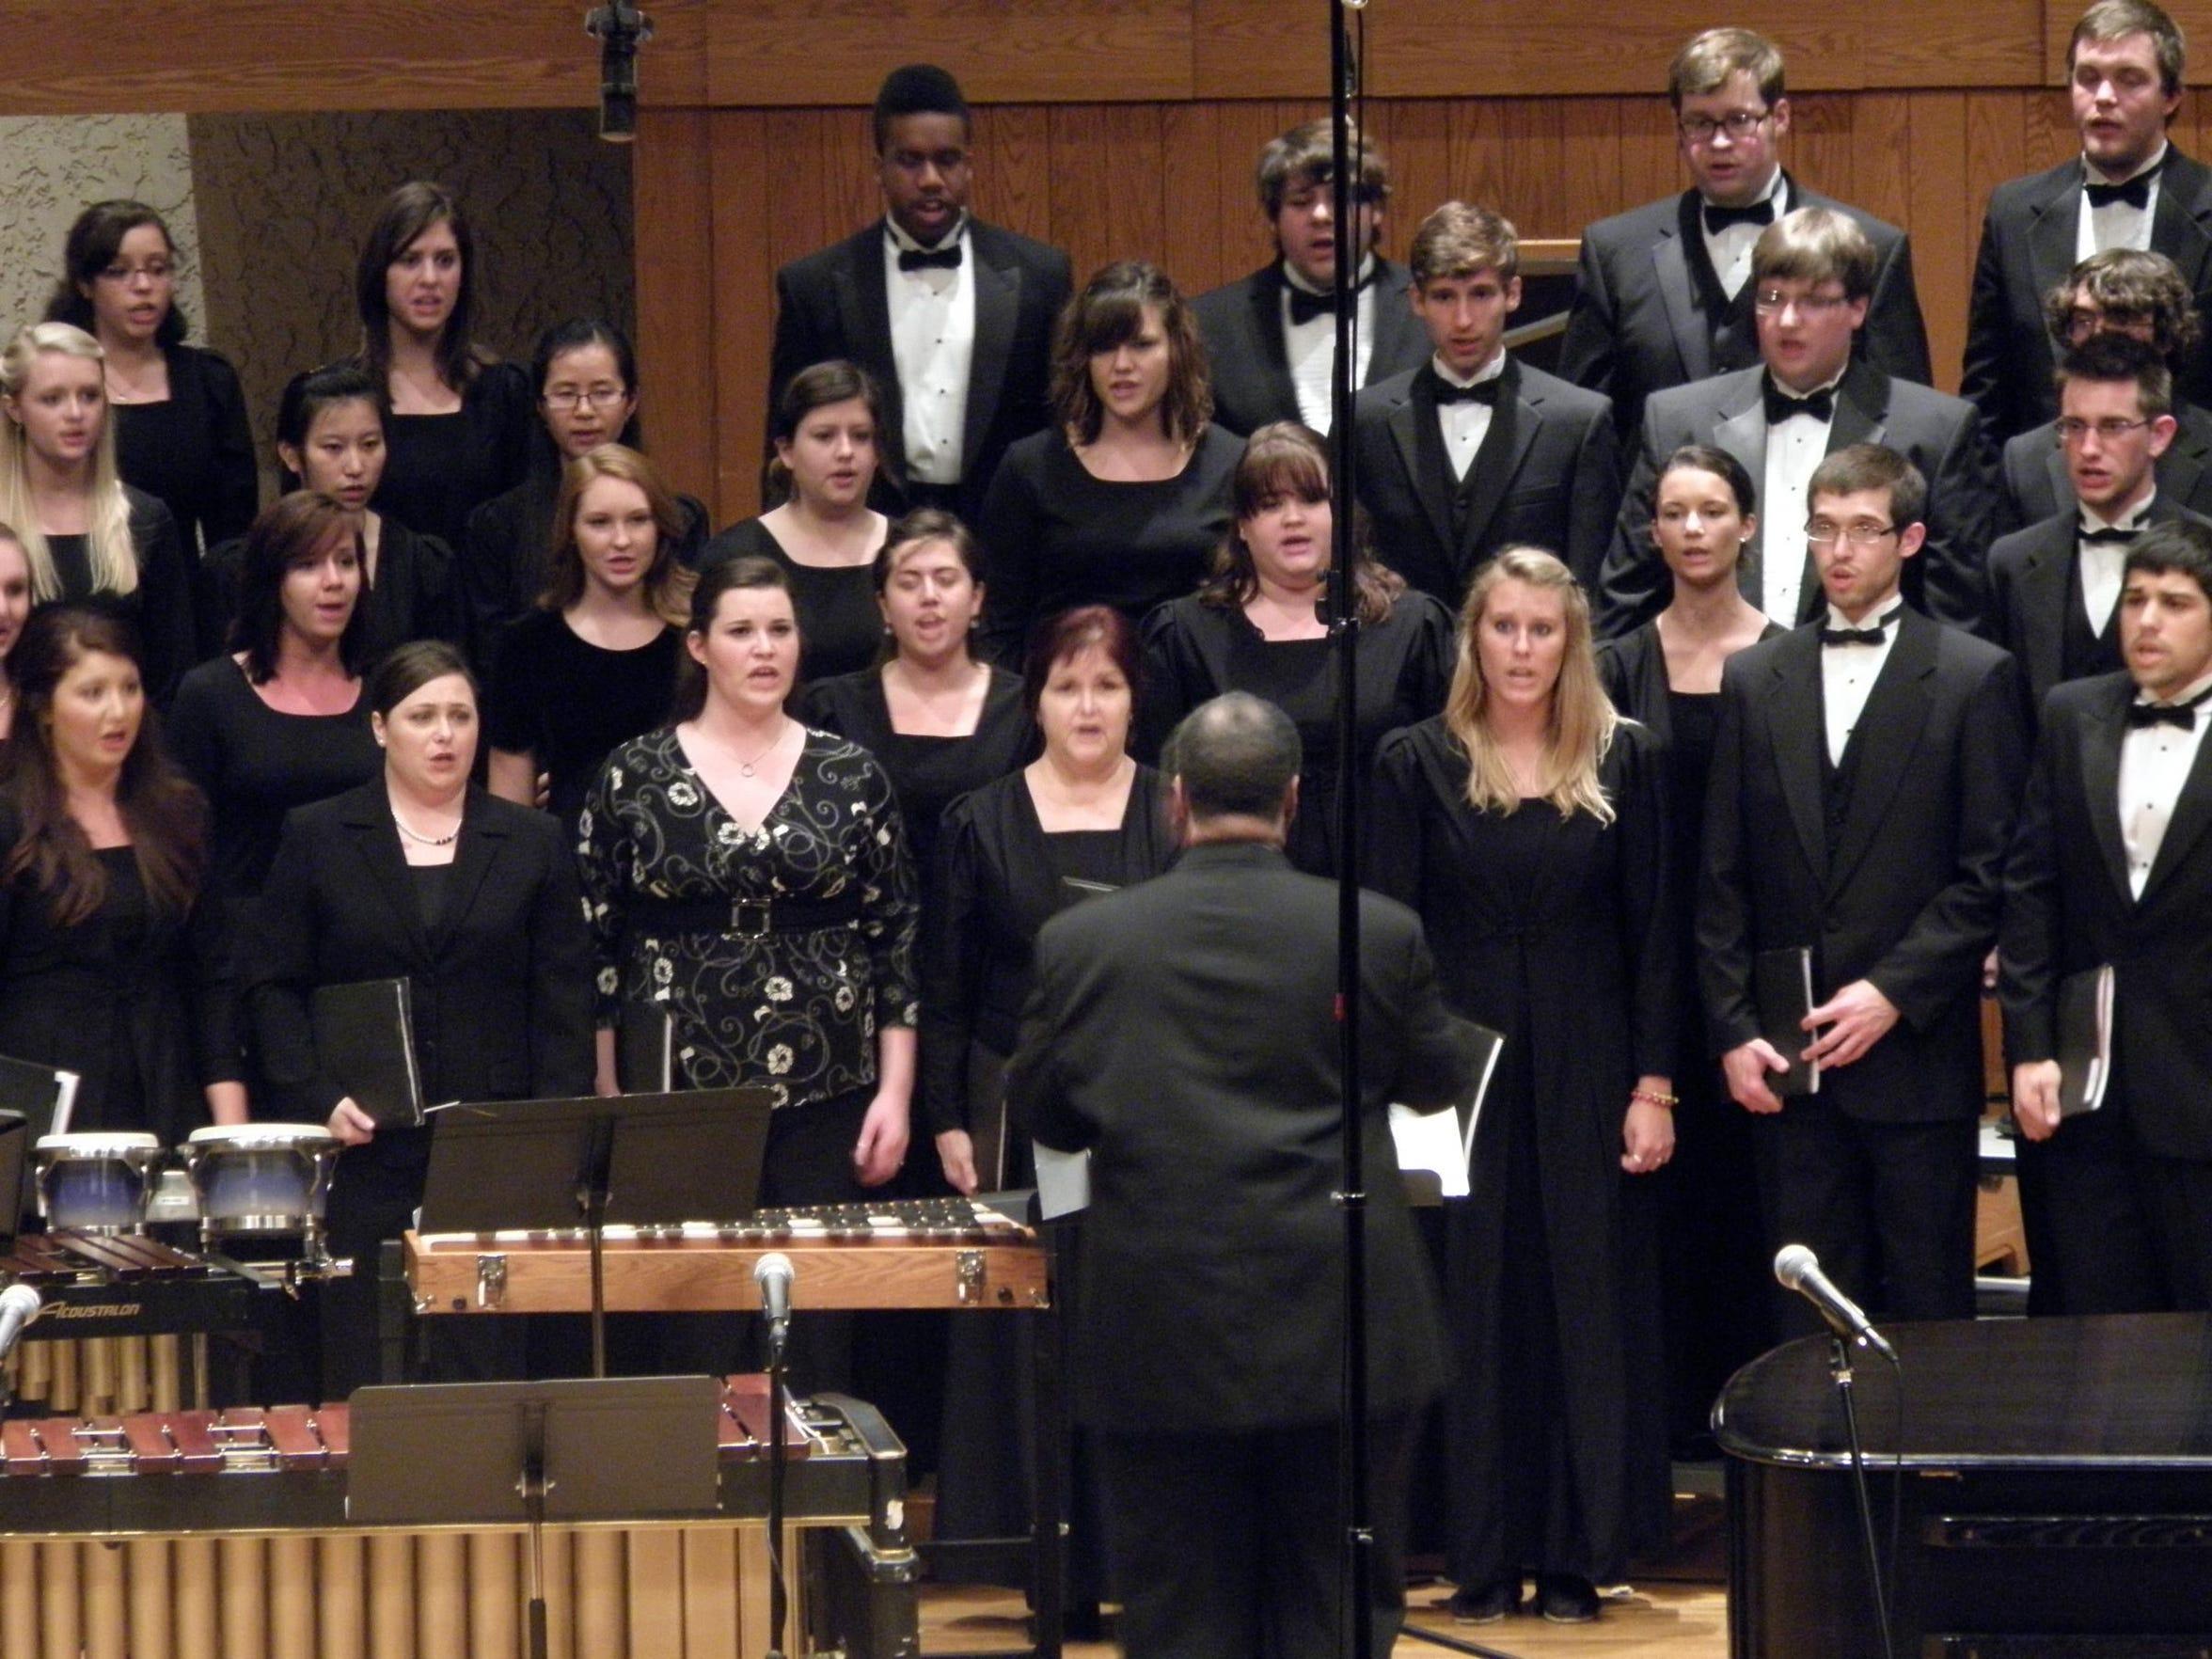 The MTSU Concert Chorale, MTSU Schola Cantorum and